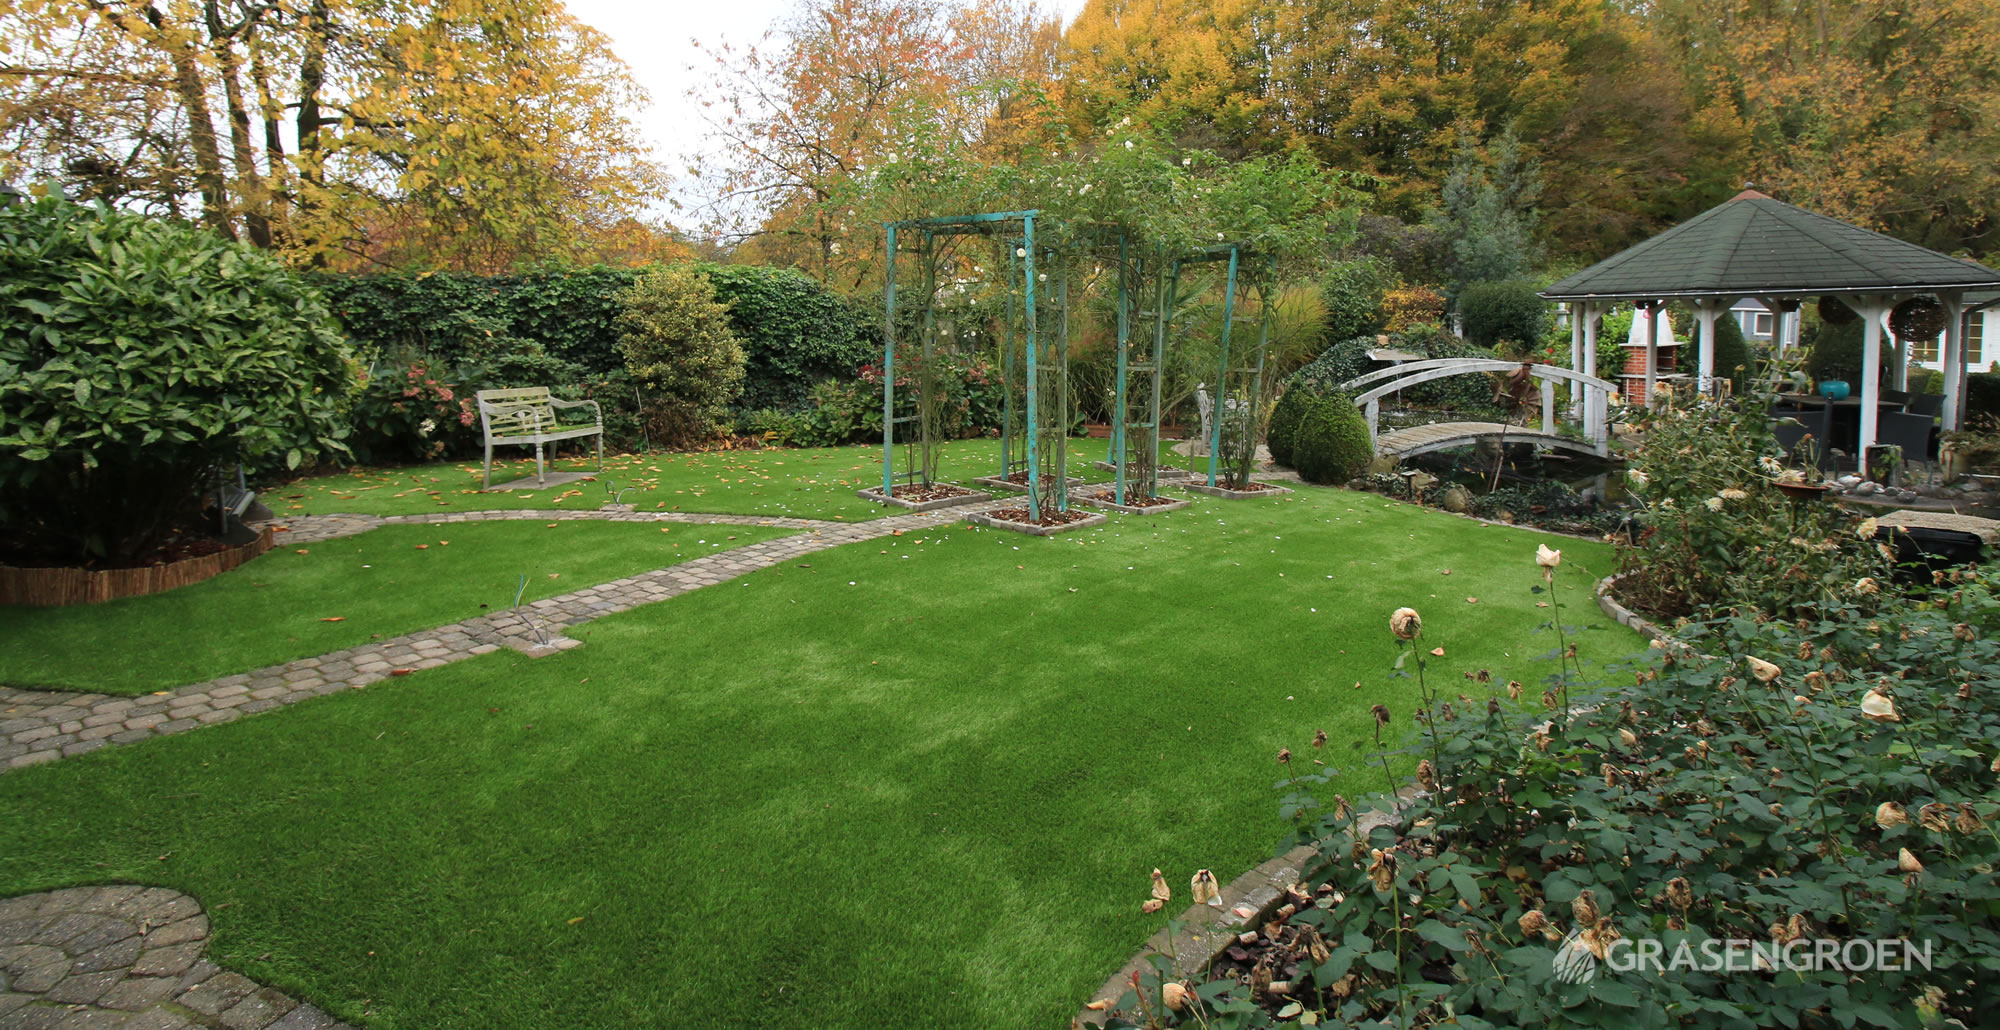 Kunstgrasleggensintjoriswinge16 • Gras en Groen Kunstgras